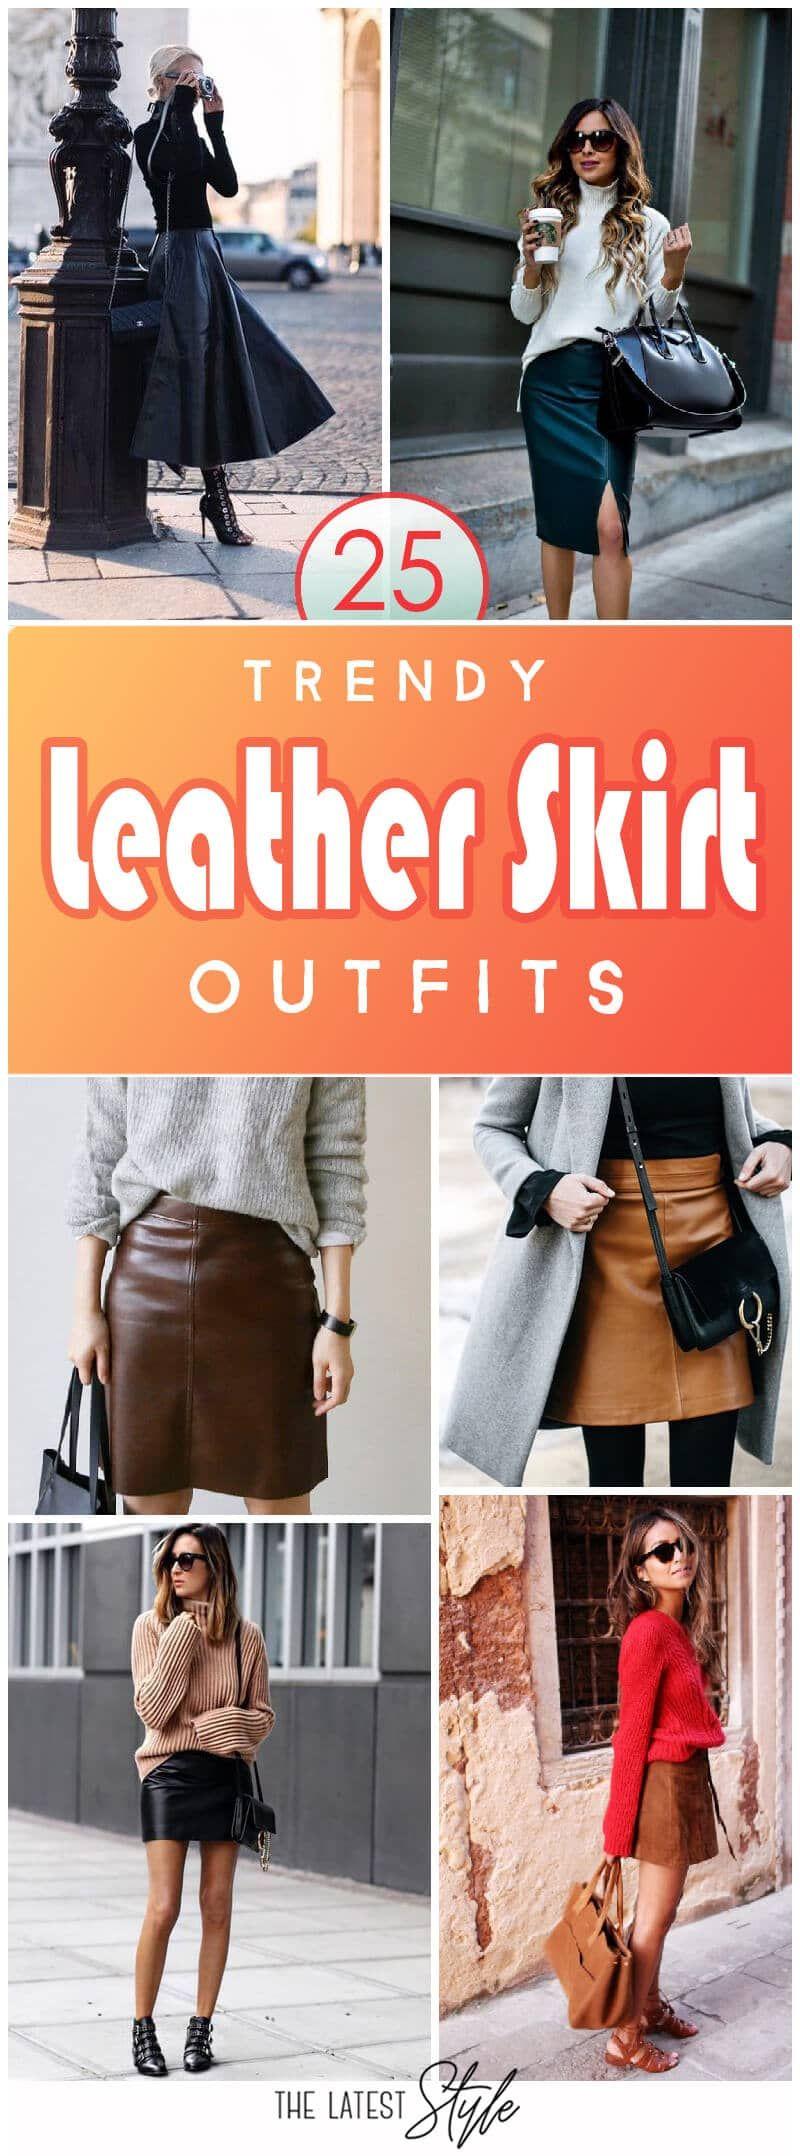 25 trendige Lederrock-Outfits für saisonale Stylistas #trendyoutfits